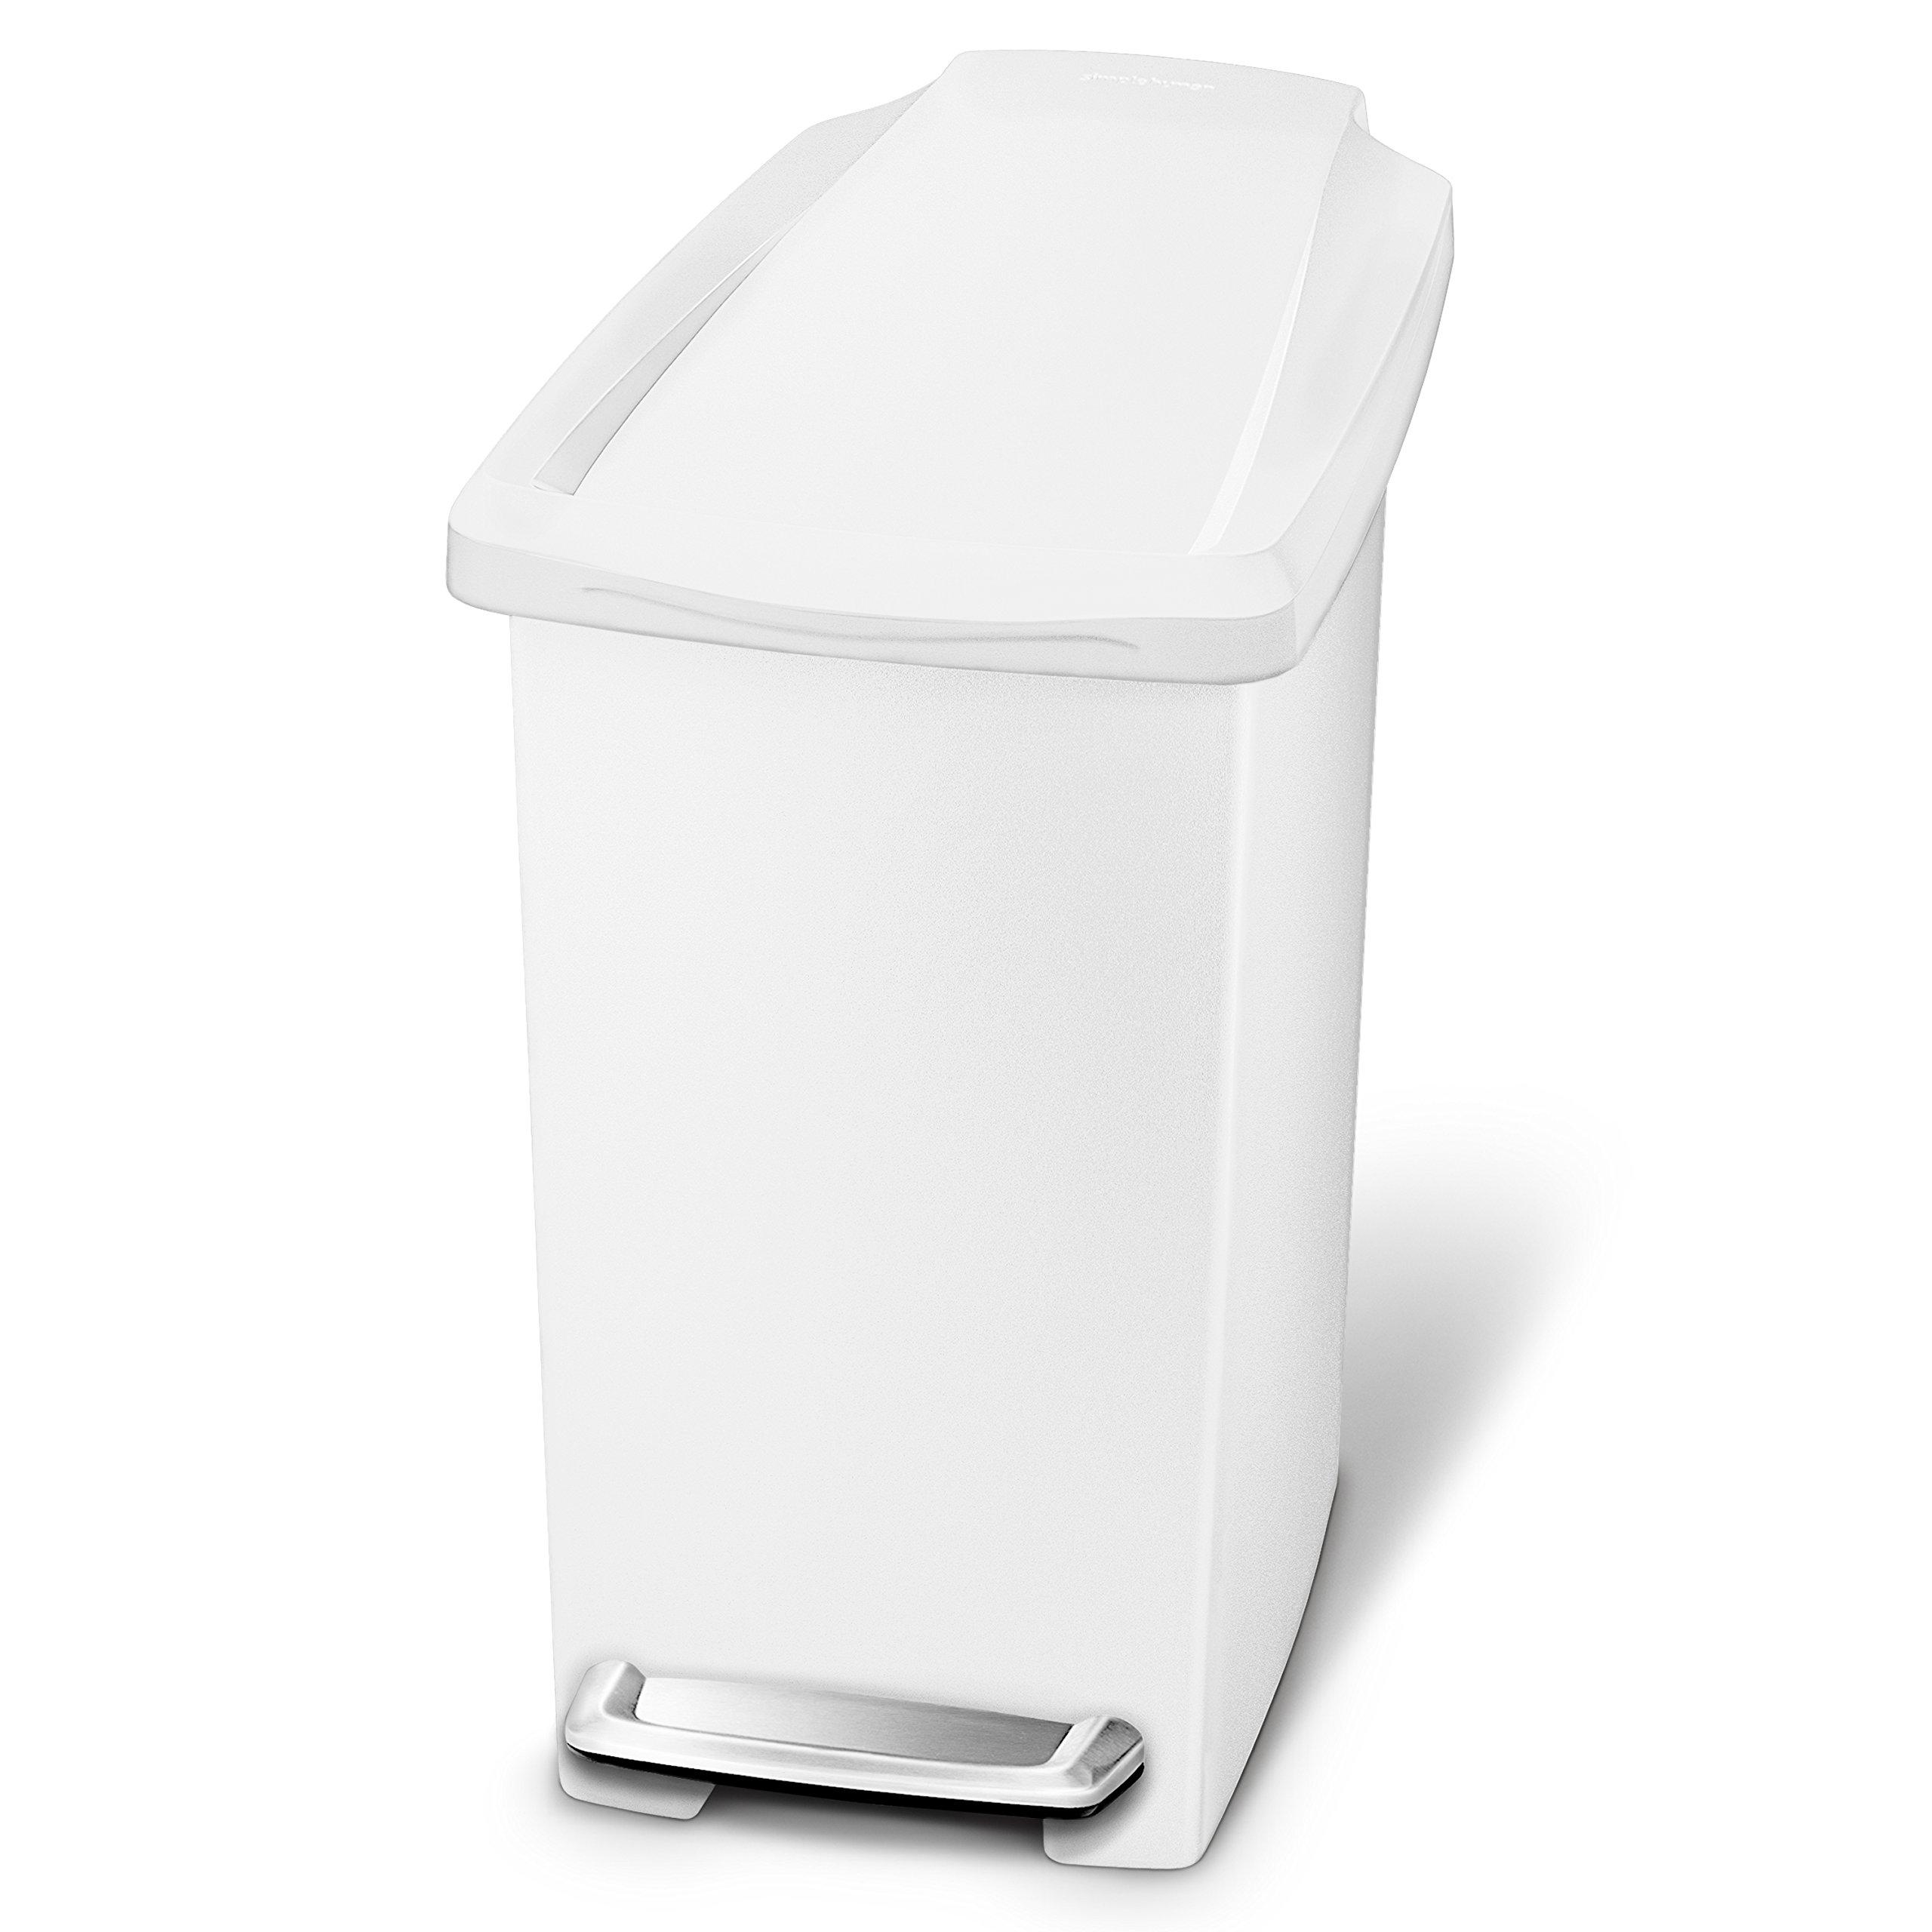 simplehuman 10 Liter / 2.6 Gallon Compact Slim Bathroom or Office Step Trash Can, White Plastic by simplehuman